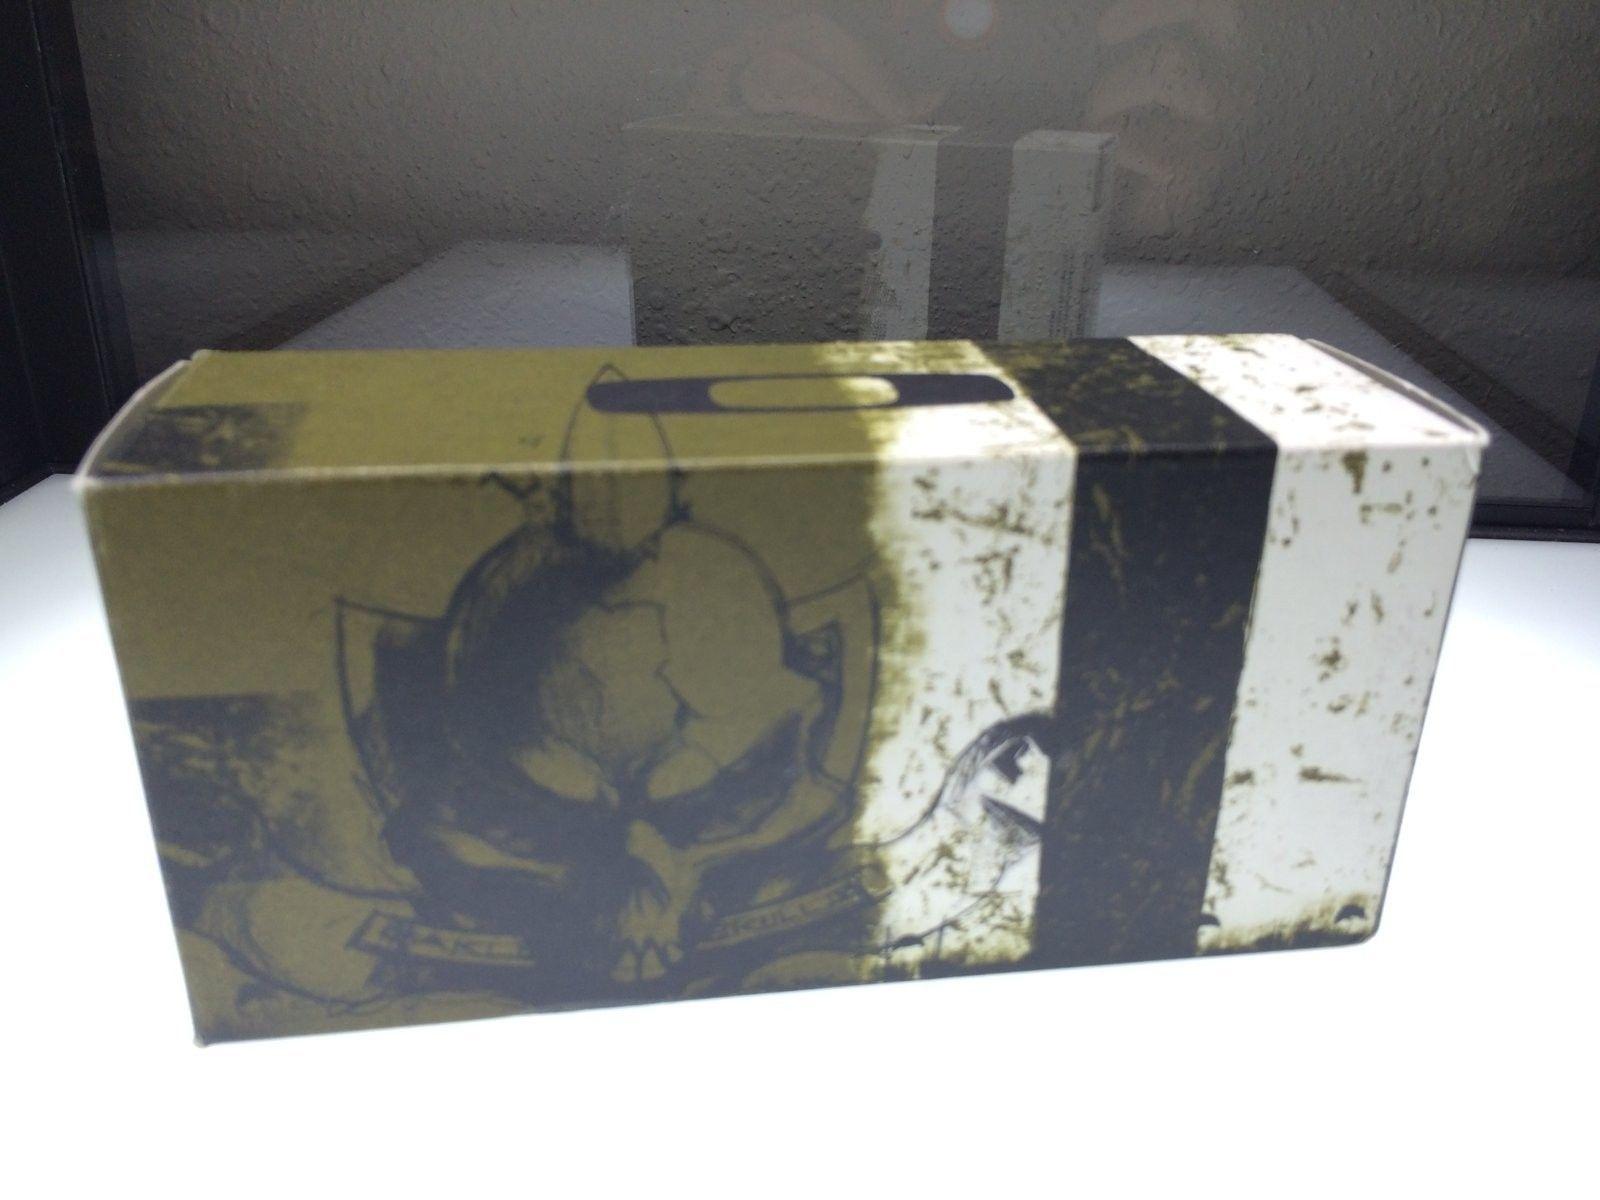 10th Mountain Division Gascan box - image.jpeg